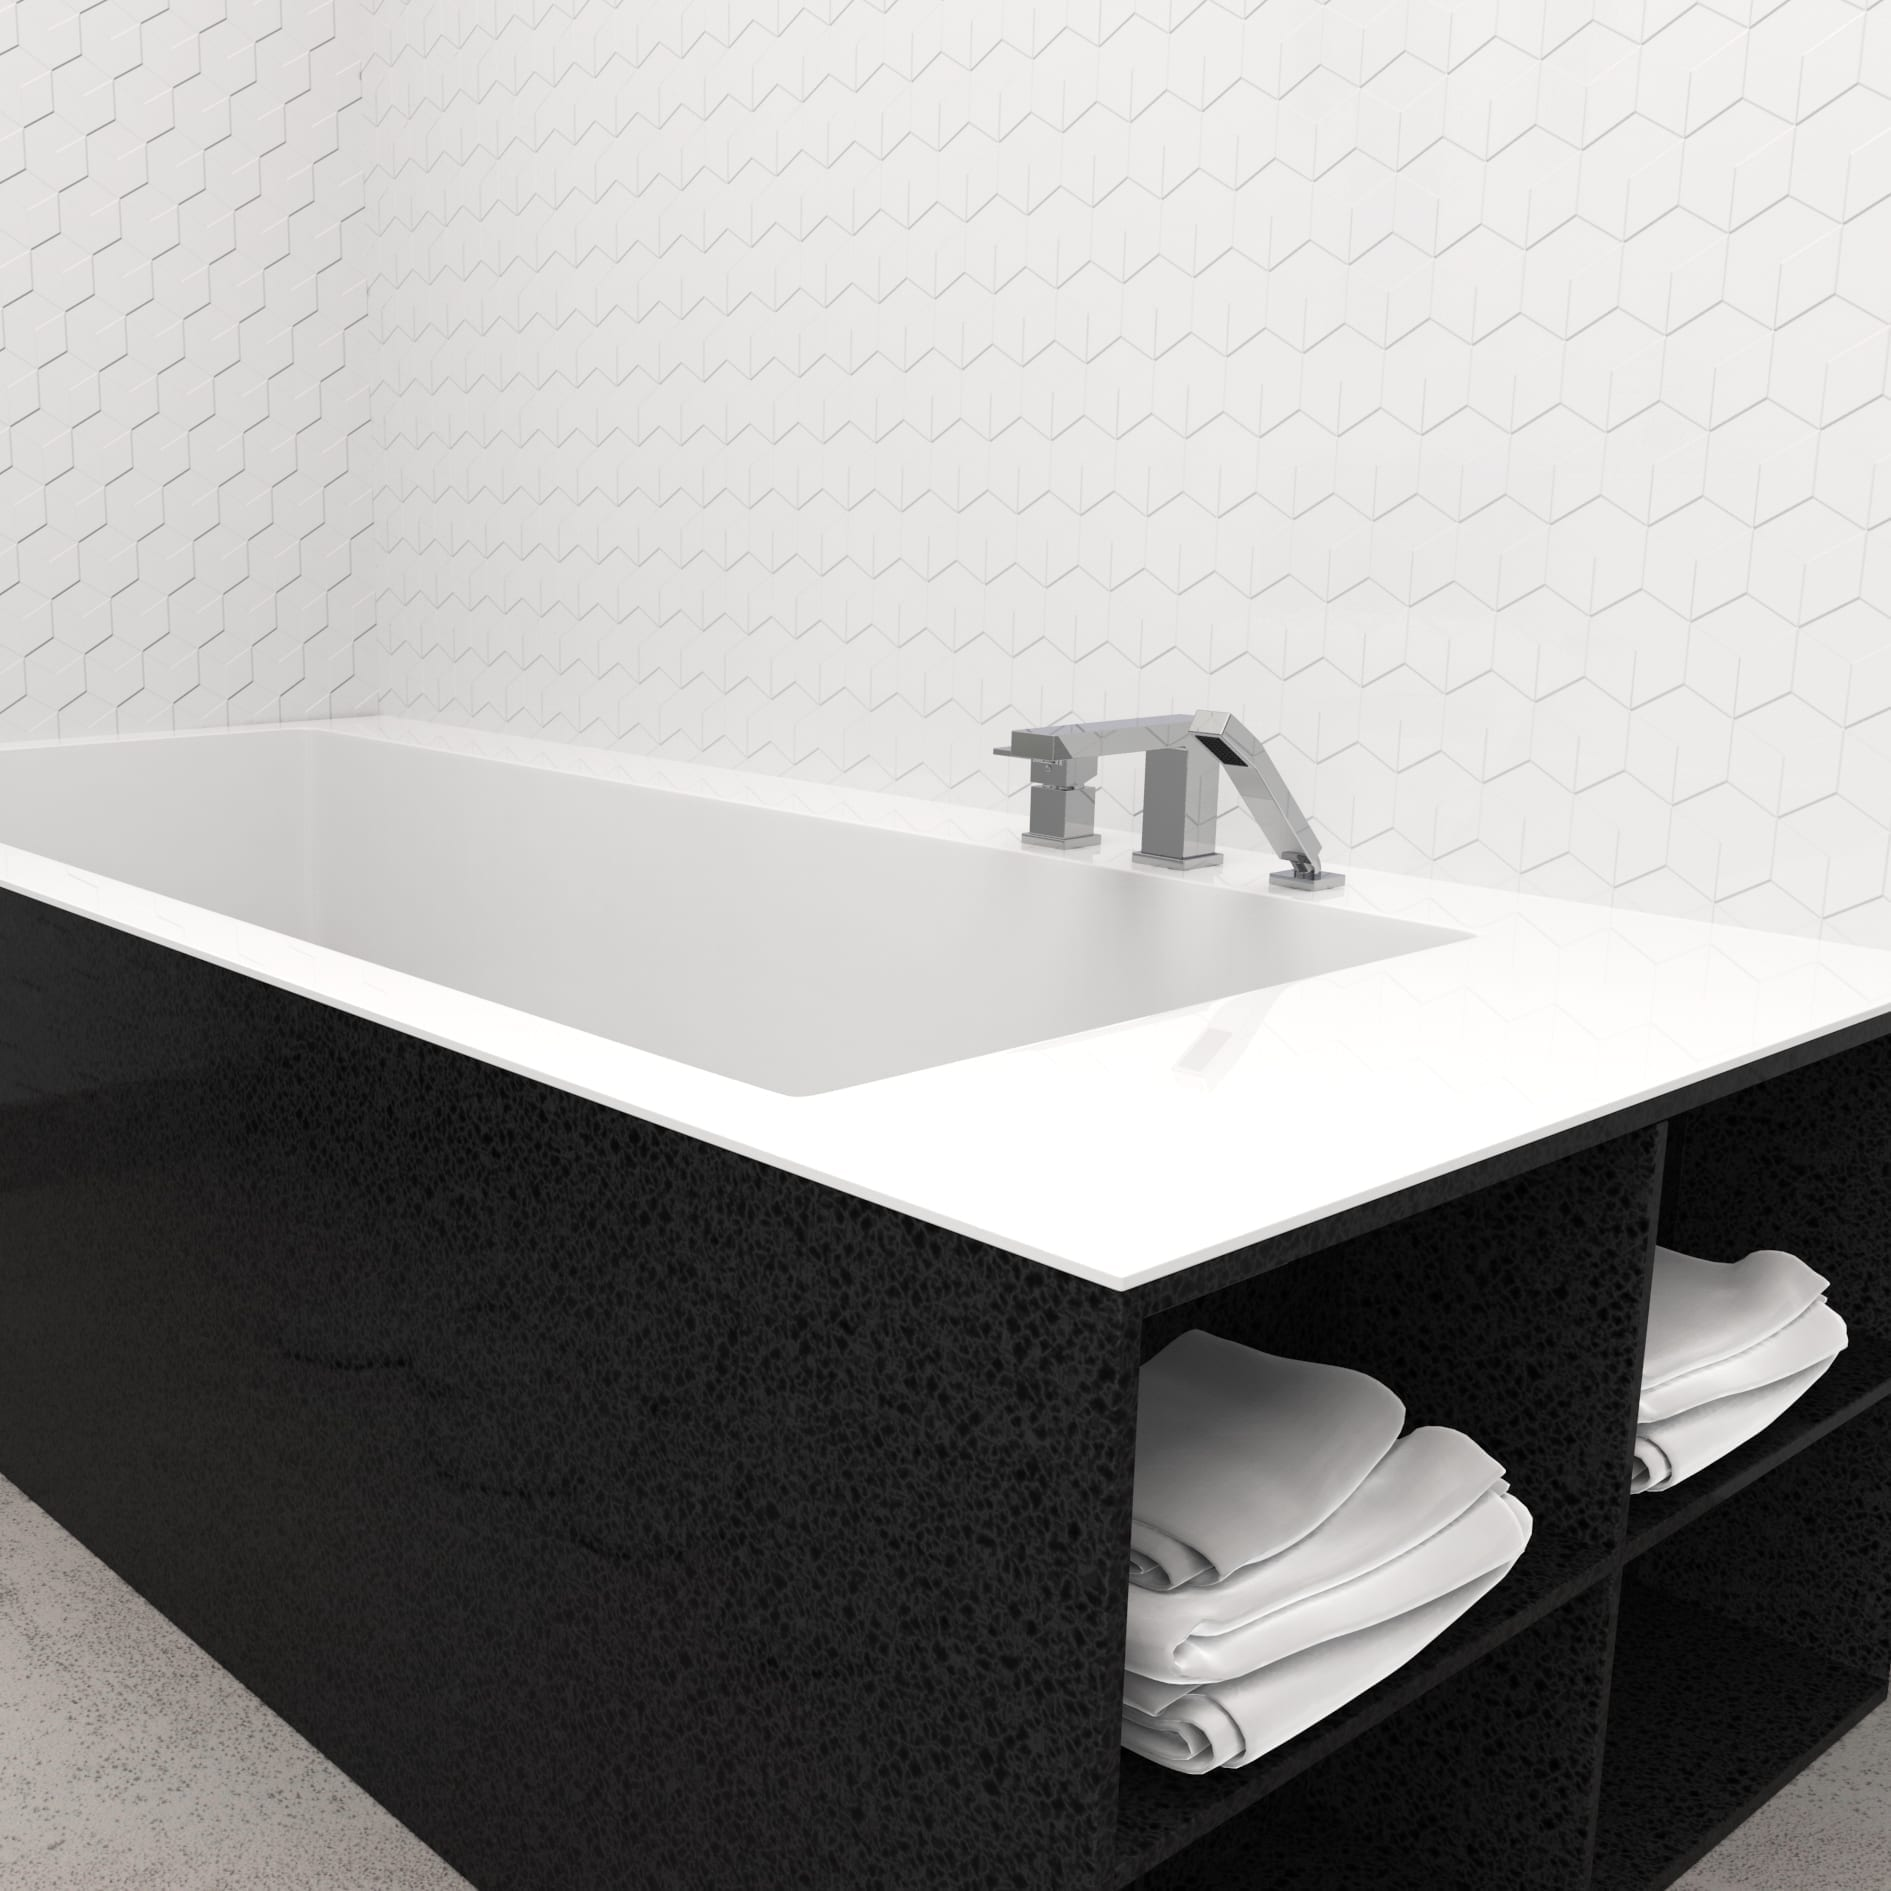 Bathtub Faucet - Complete model for Roman Bathtub, Hand Shower ...